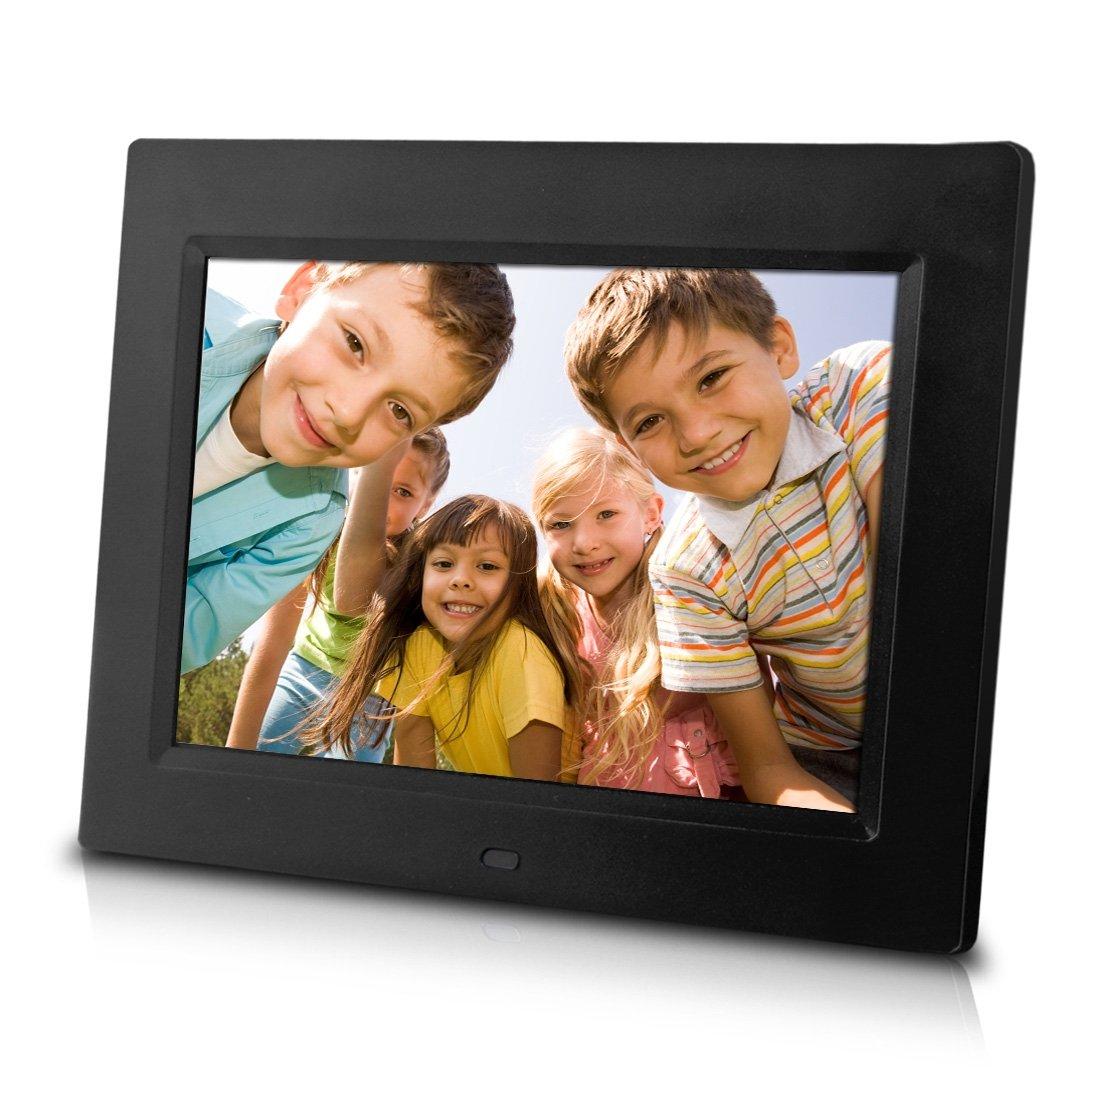 Amazoncom Sungale Cd802 8 Inch Digital Photo Frame Multimedia